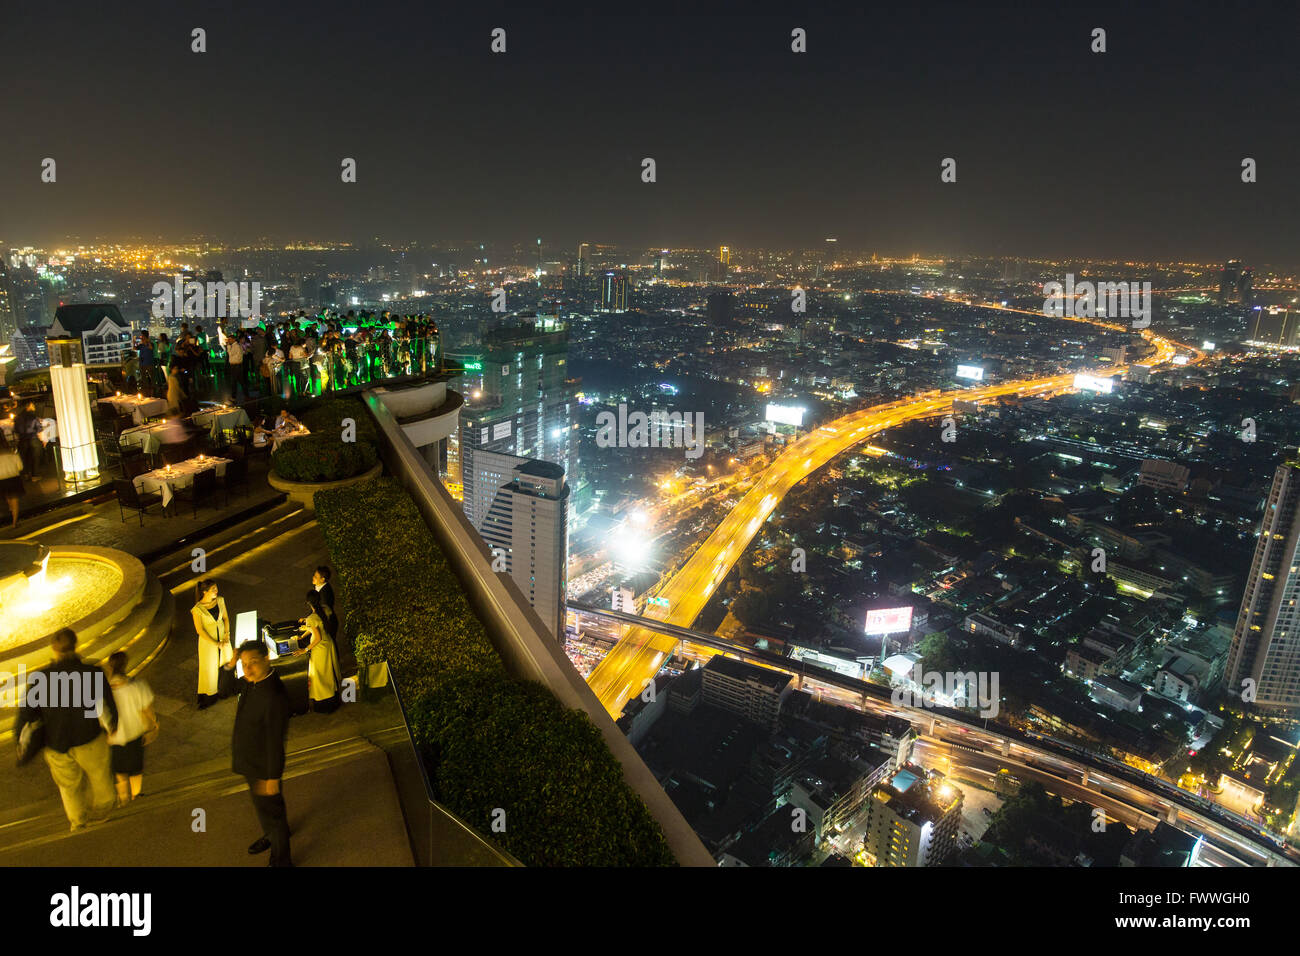 Guests at the Sky Bar on the Lebua State Tower with panoramic views, night shot, Bang Rak district, Bangkok, Thailand Stock Photo